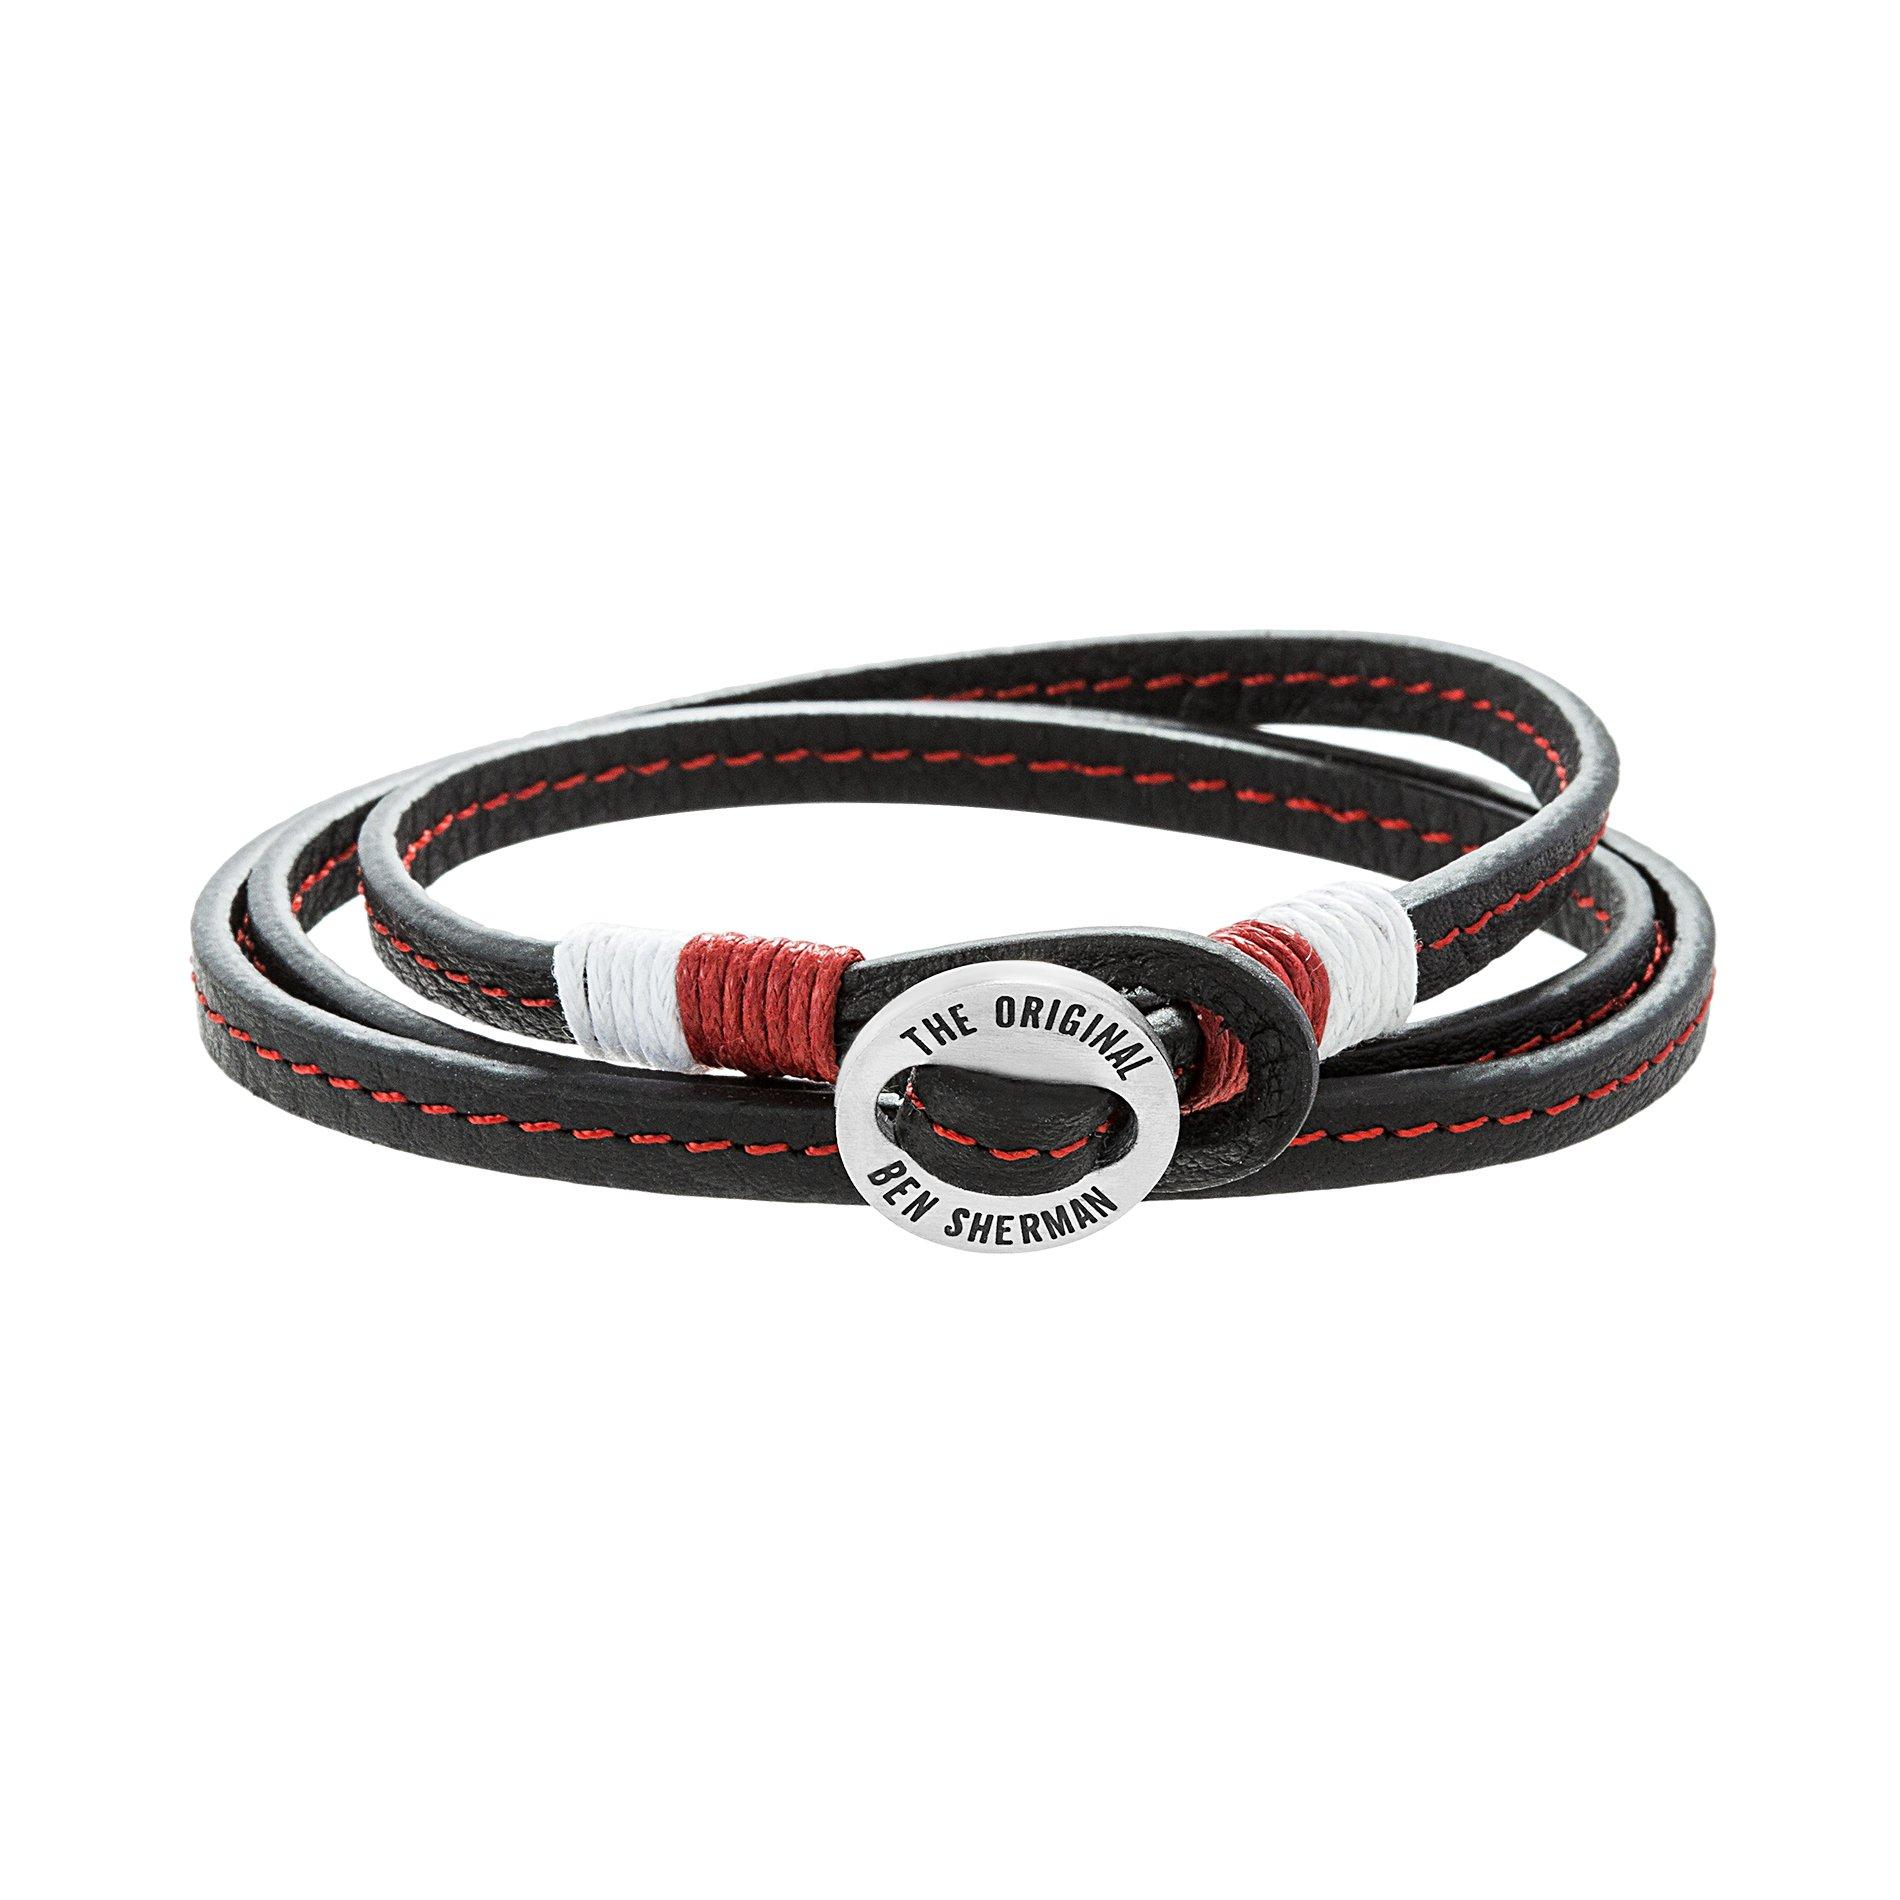 Ben Sherman Men's Stainless Steel Disc Red & White Cord Black Leather Wrap Around Bracelet